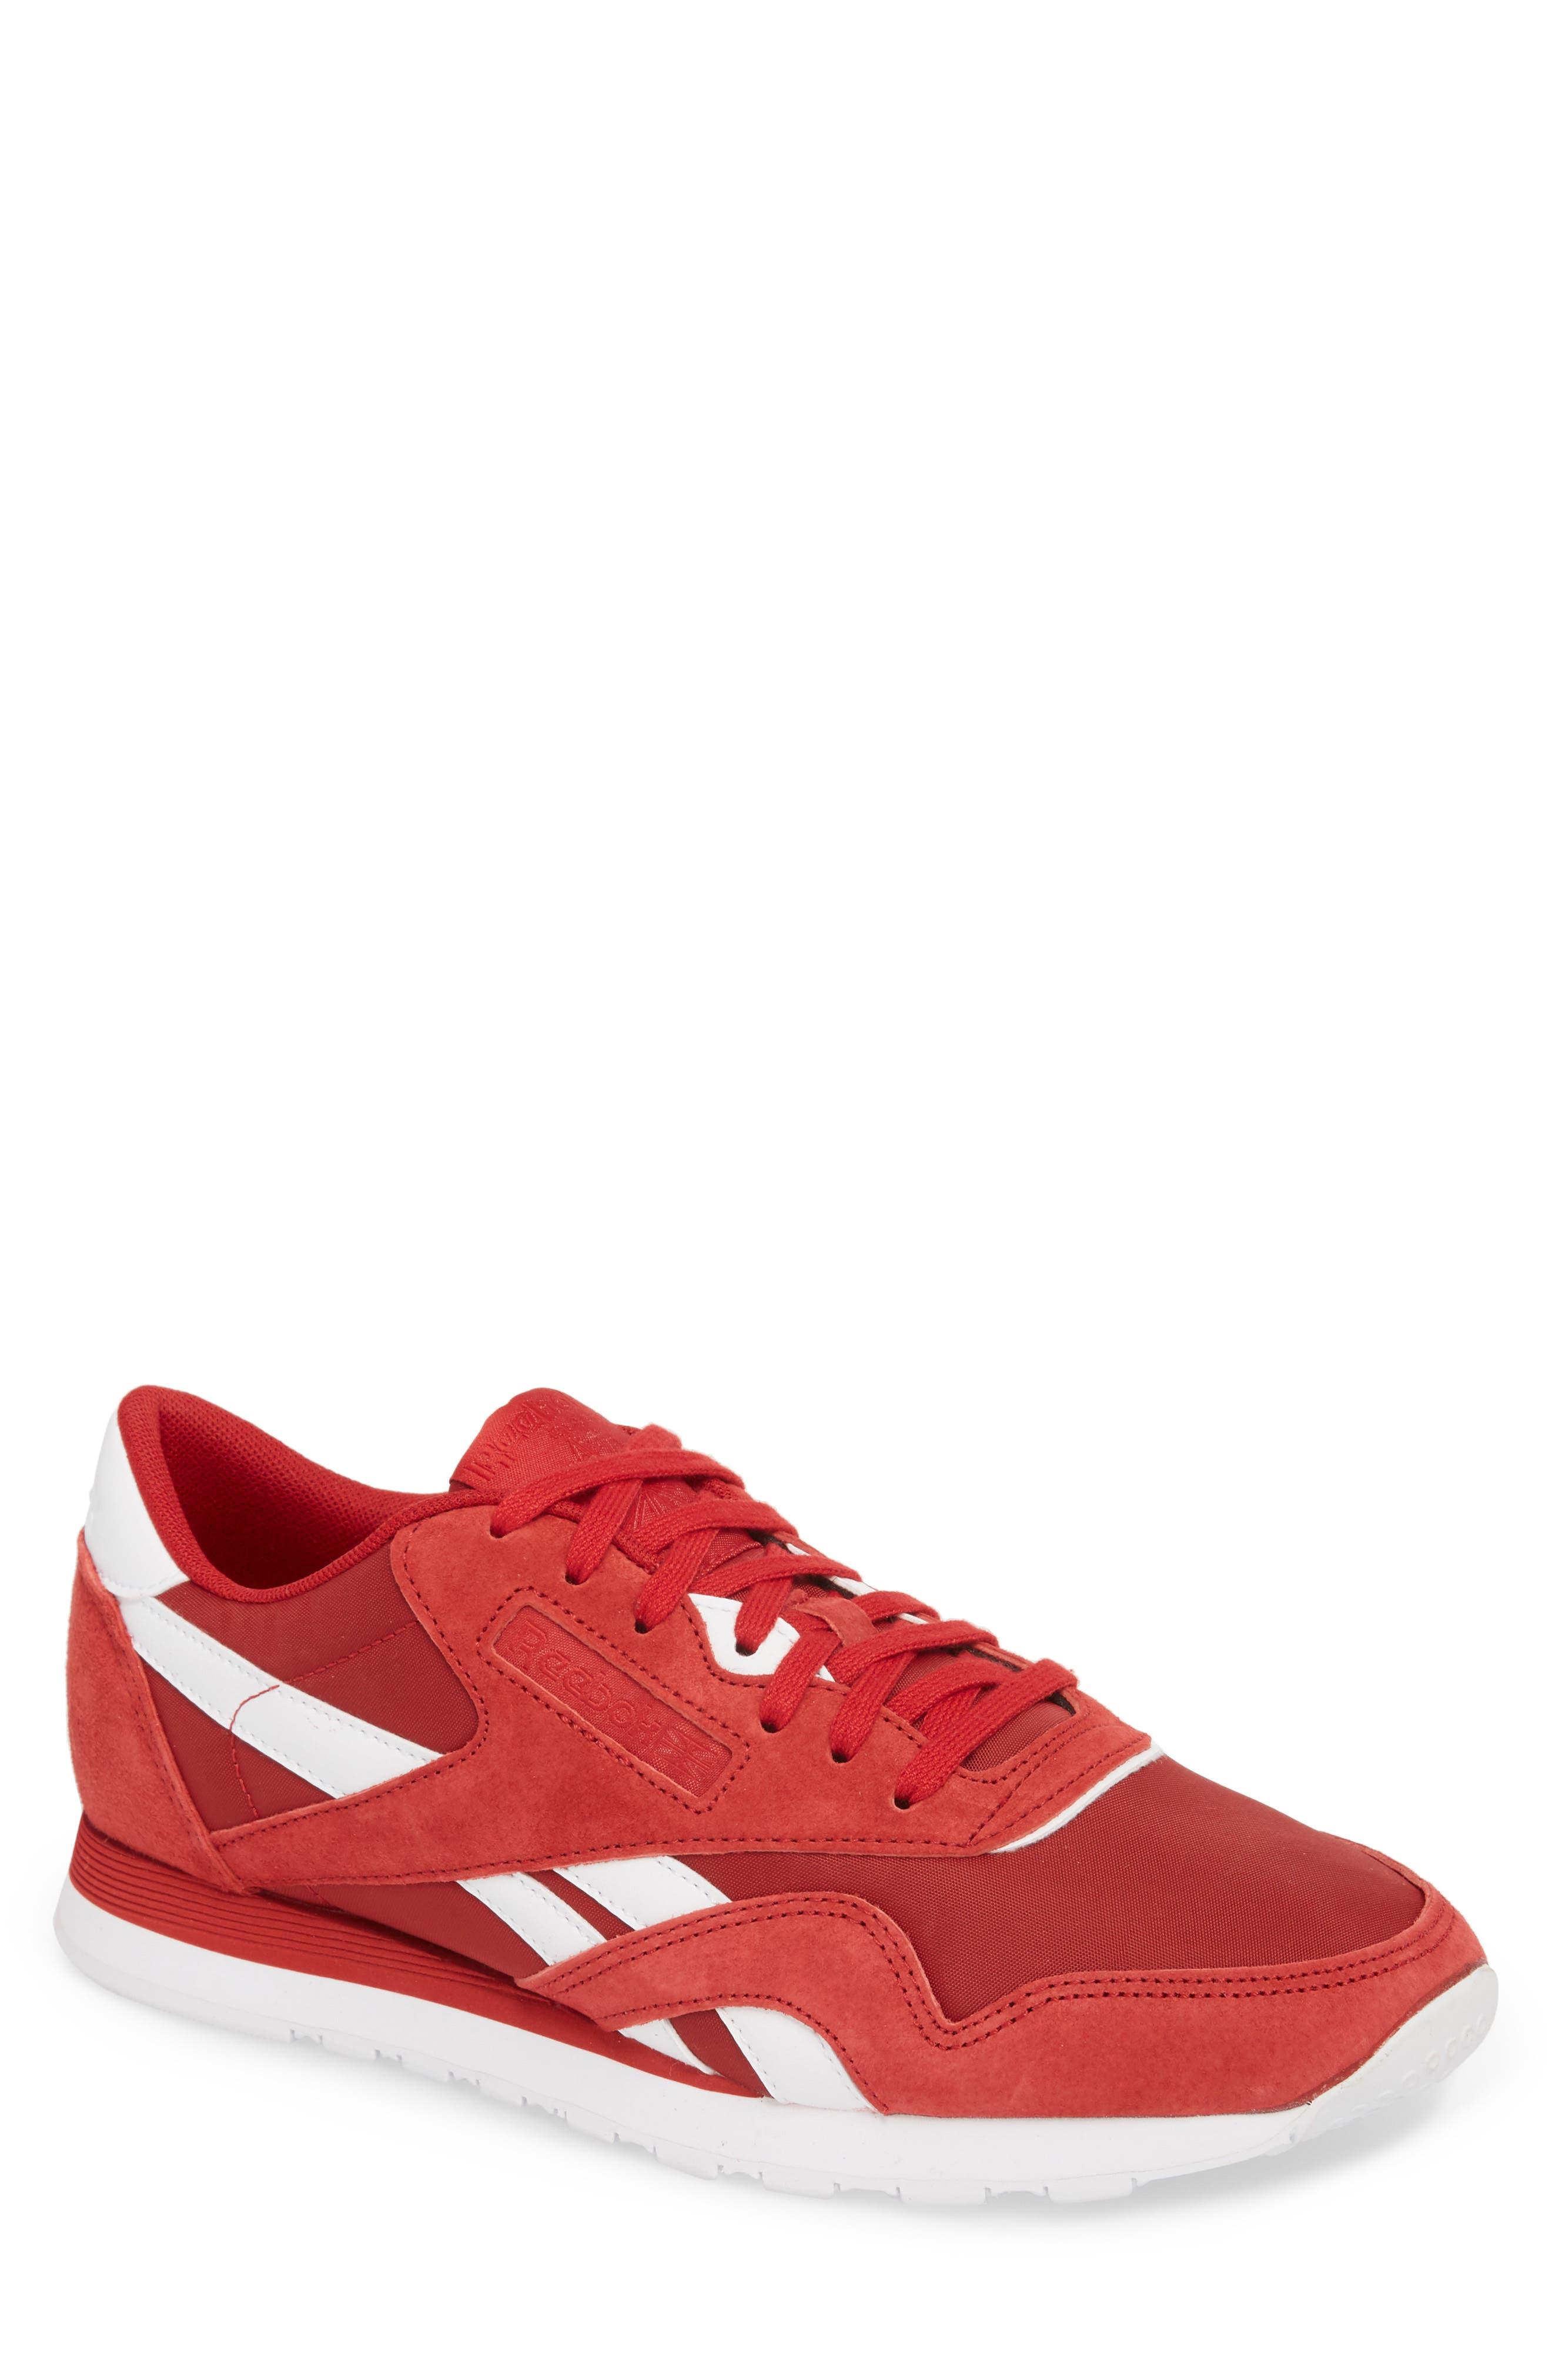 Classic Nylon PN Sneaker,                             Main thumbnail 1, color,                             Power Red/ White